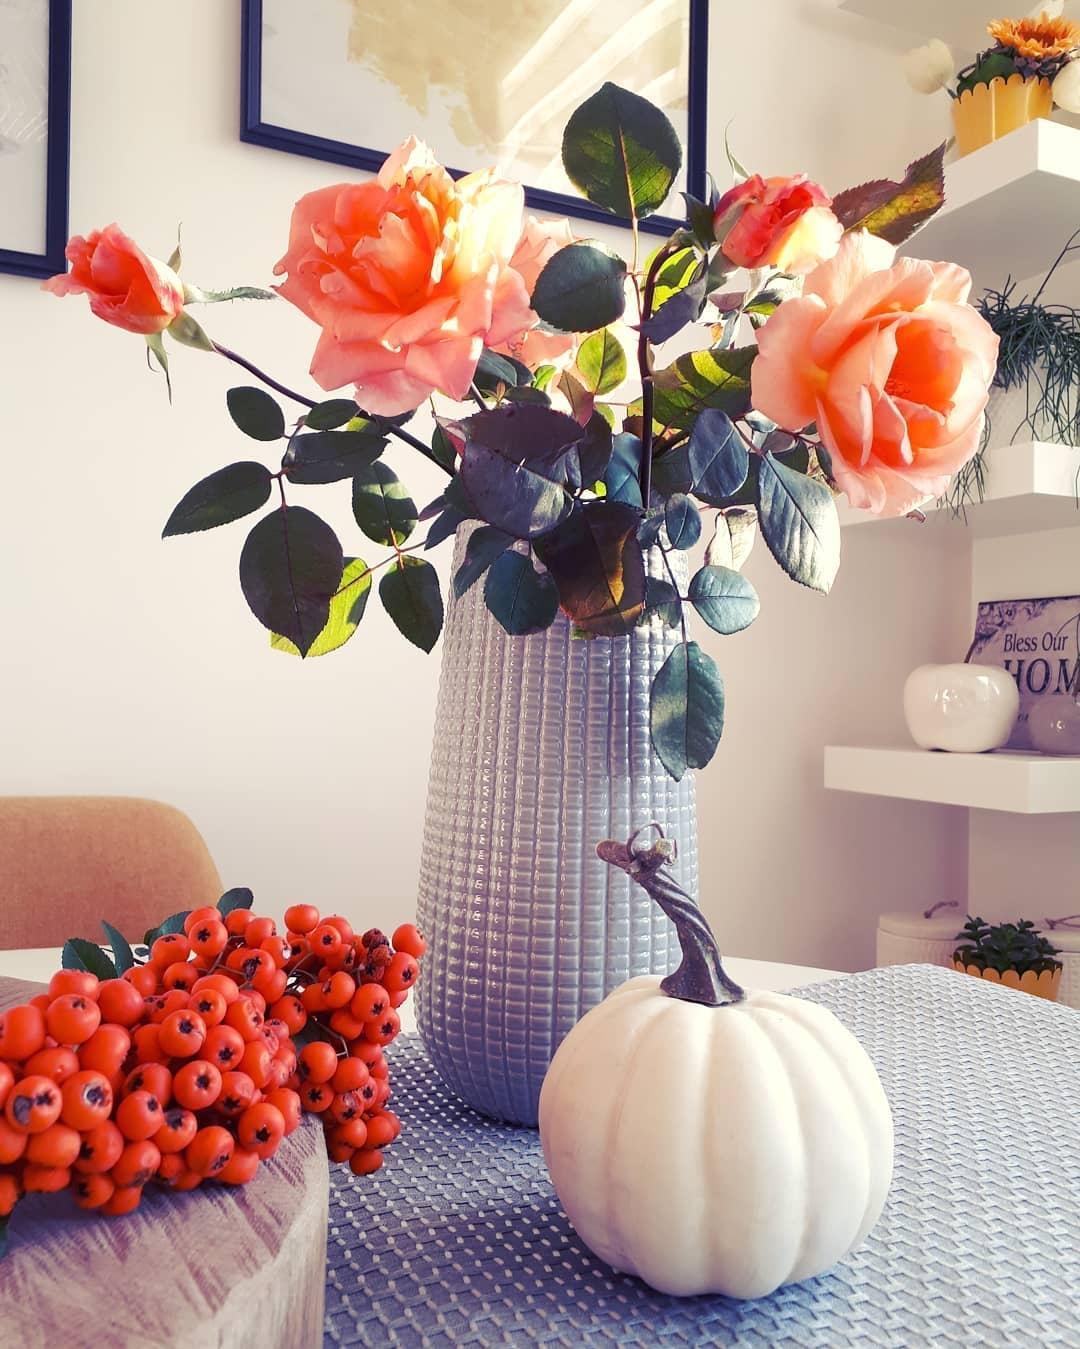 Jeseň u nás doma - Obrázok č. 22